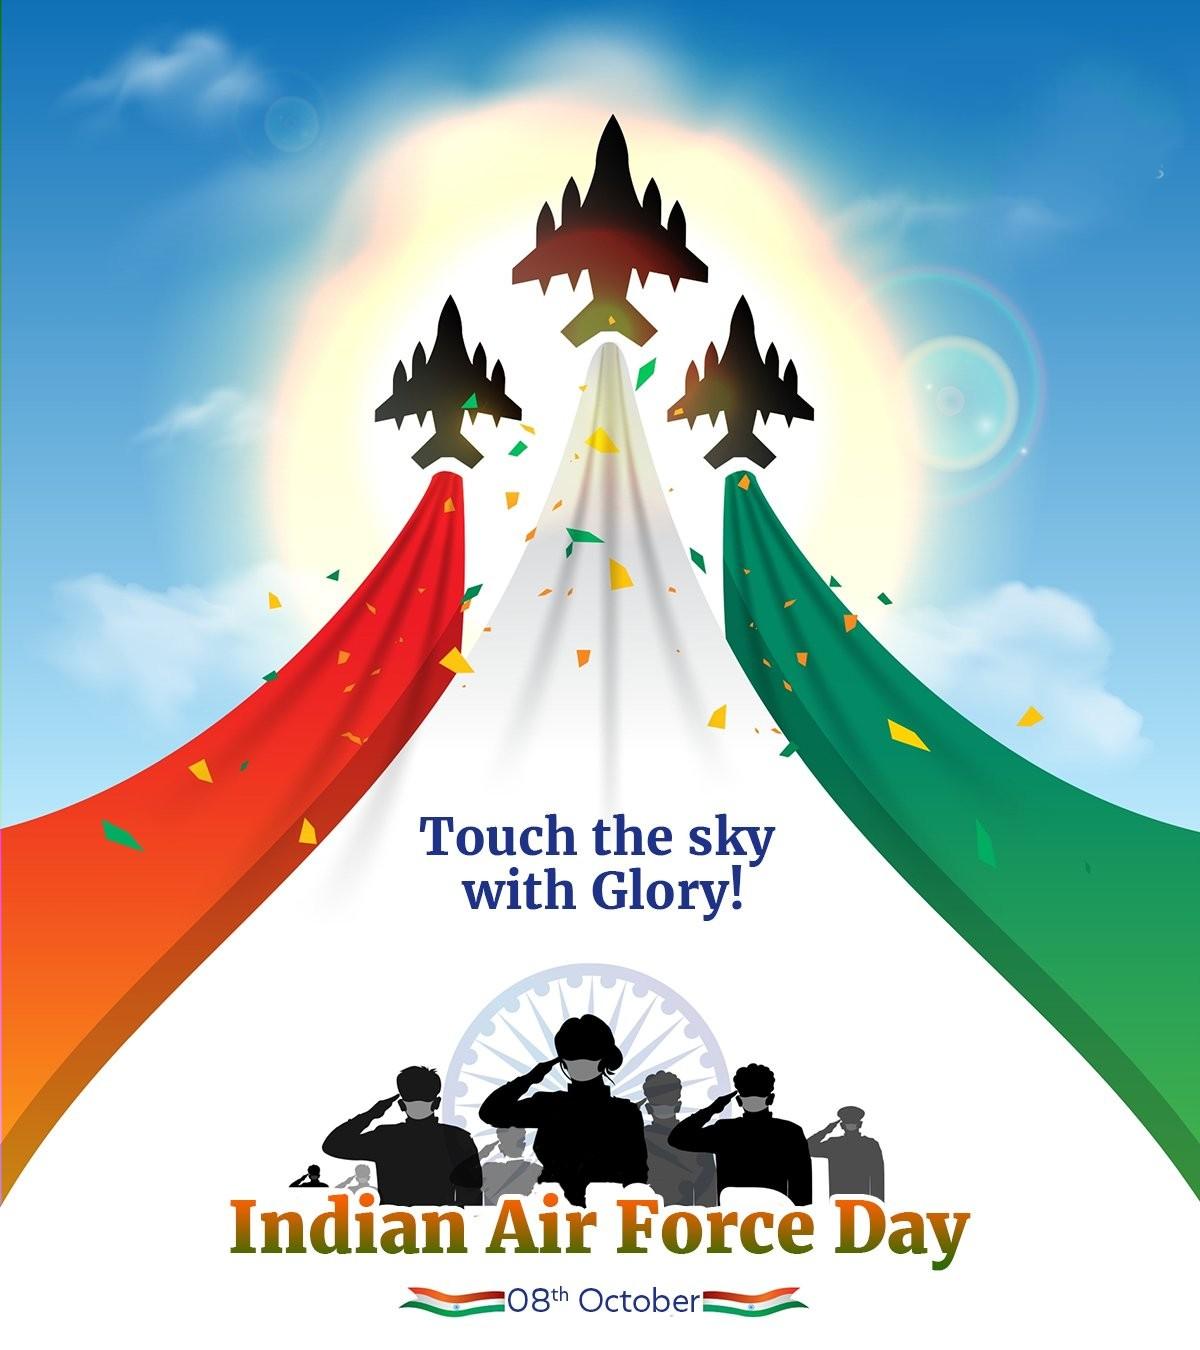 IndianAirForce